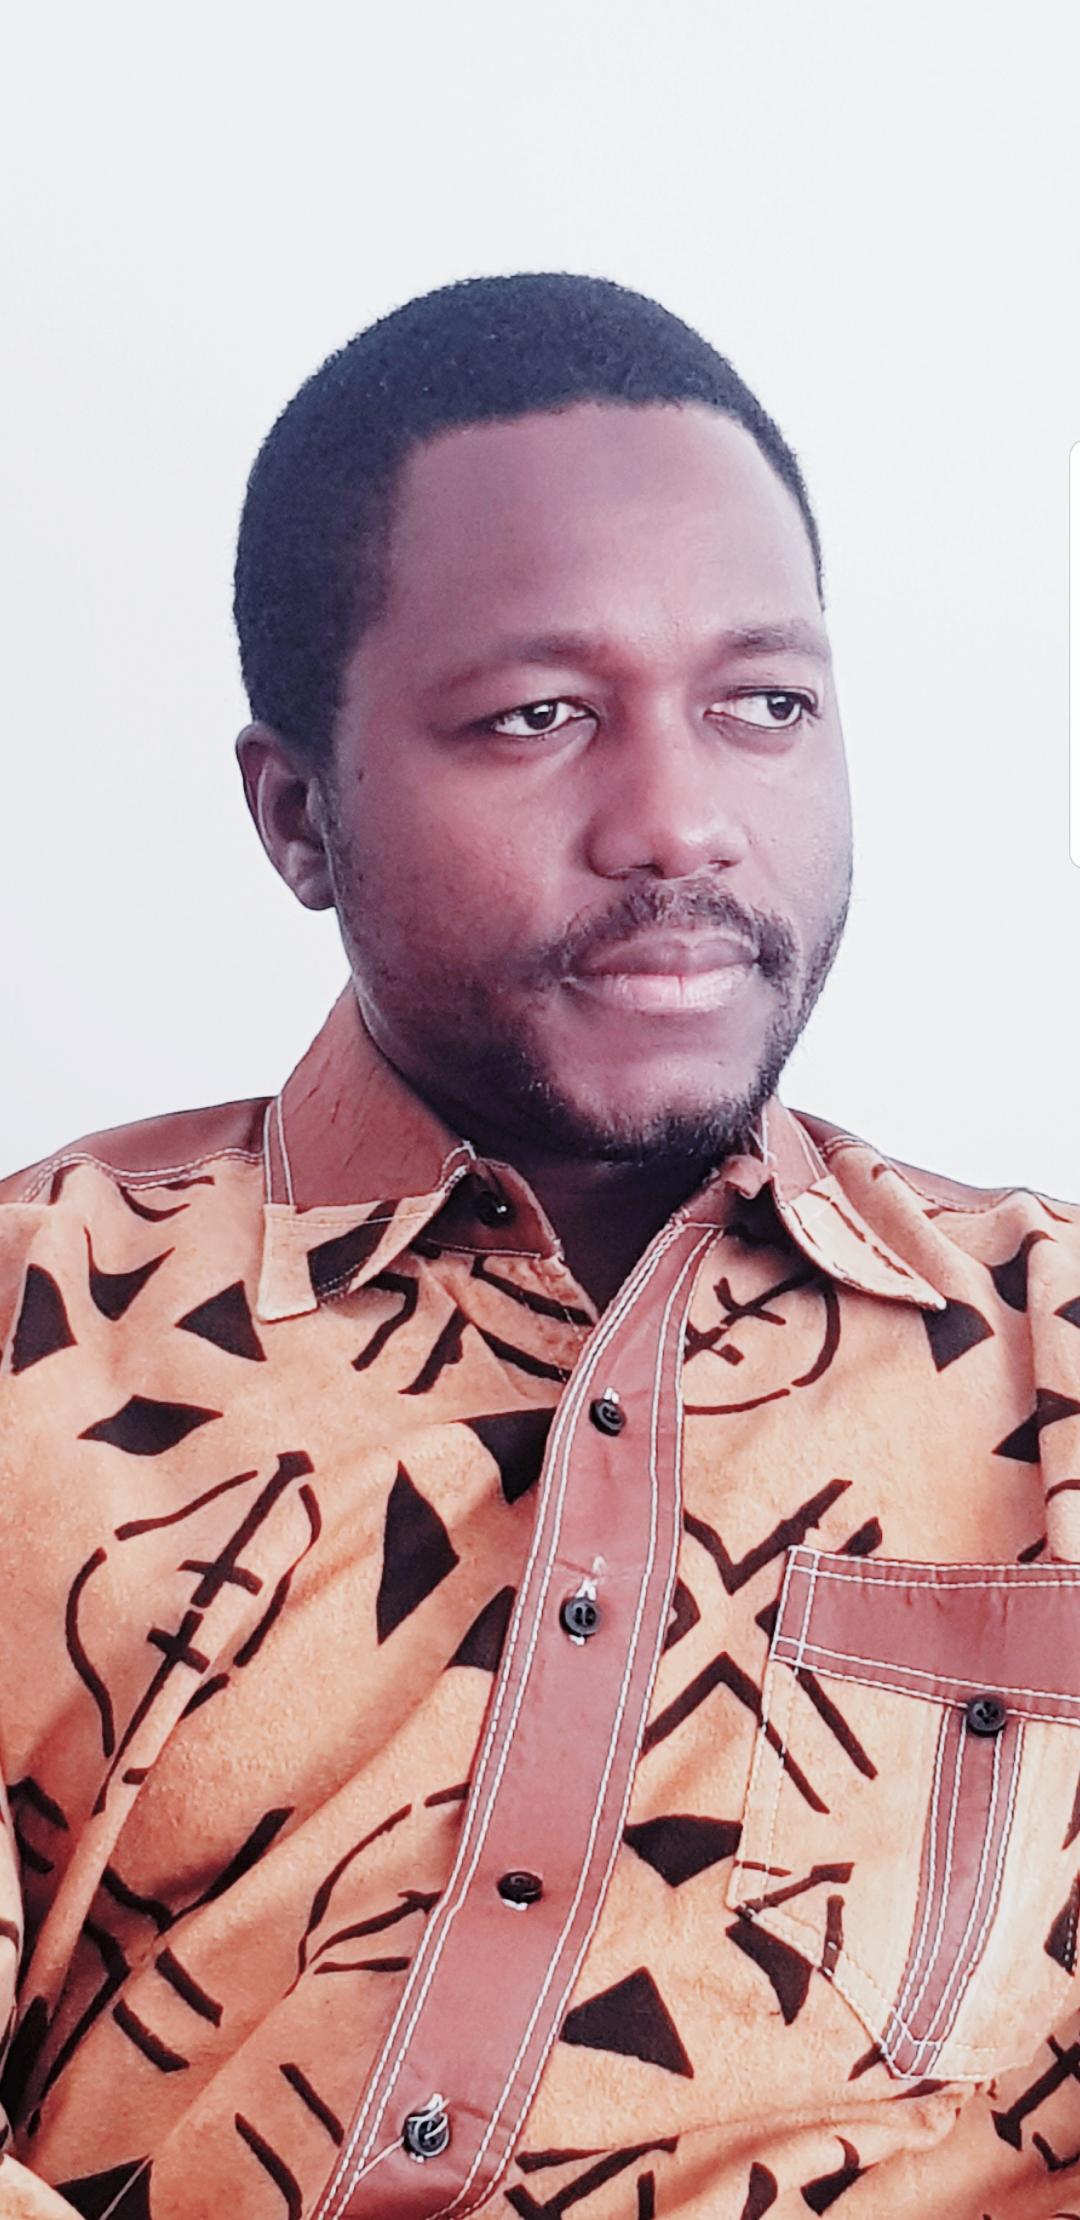 Après le règne de monsieur ibrahim boubacar KEITA